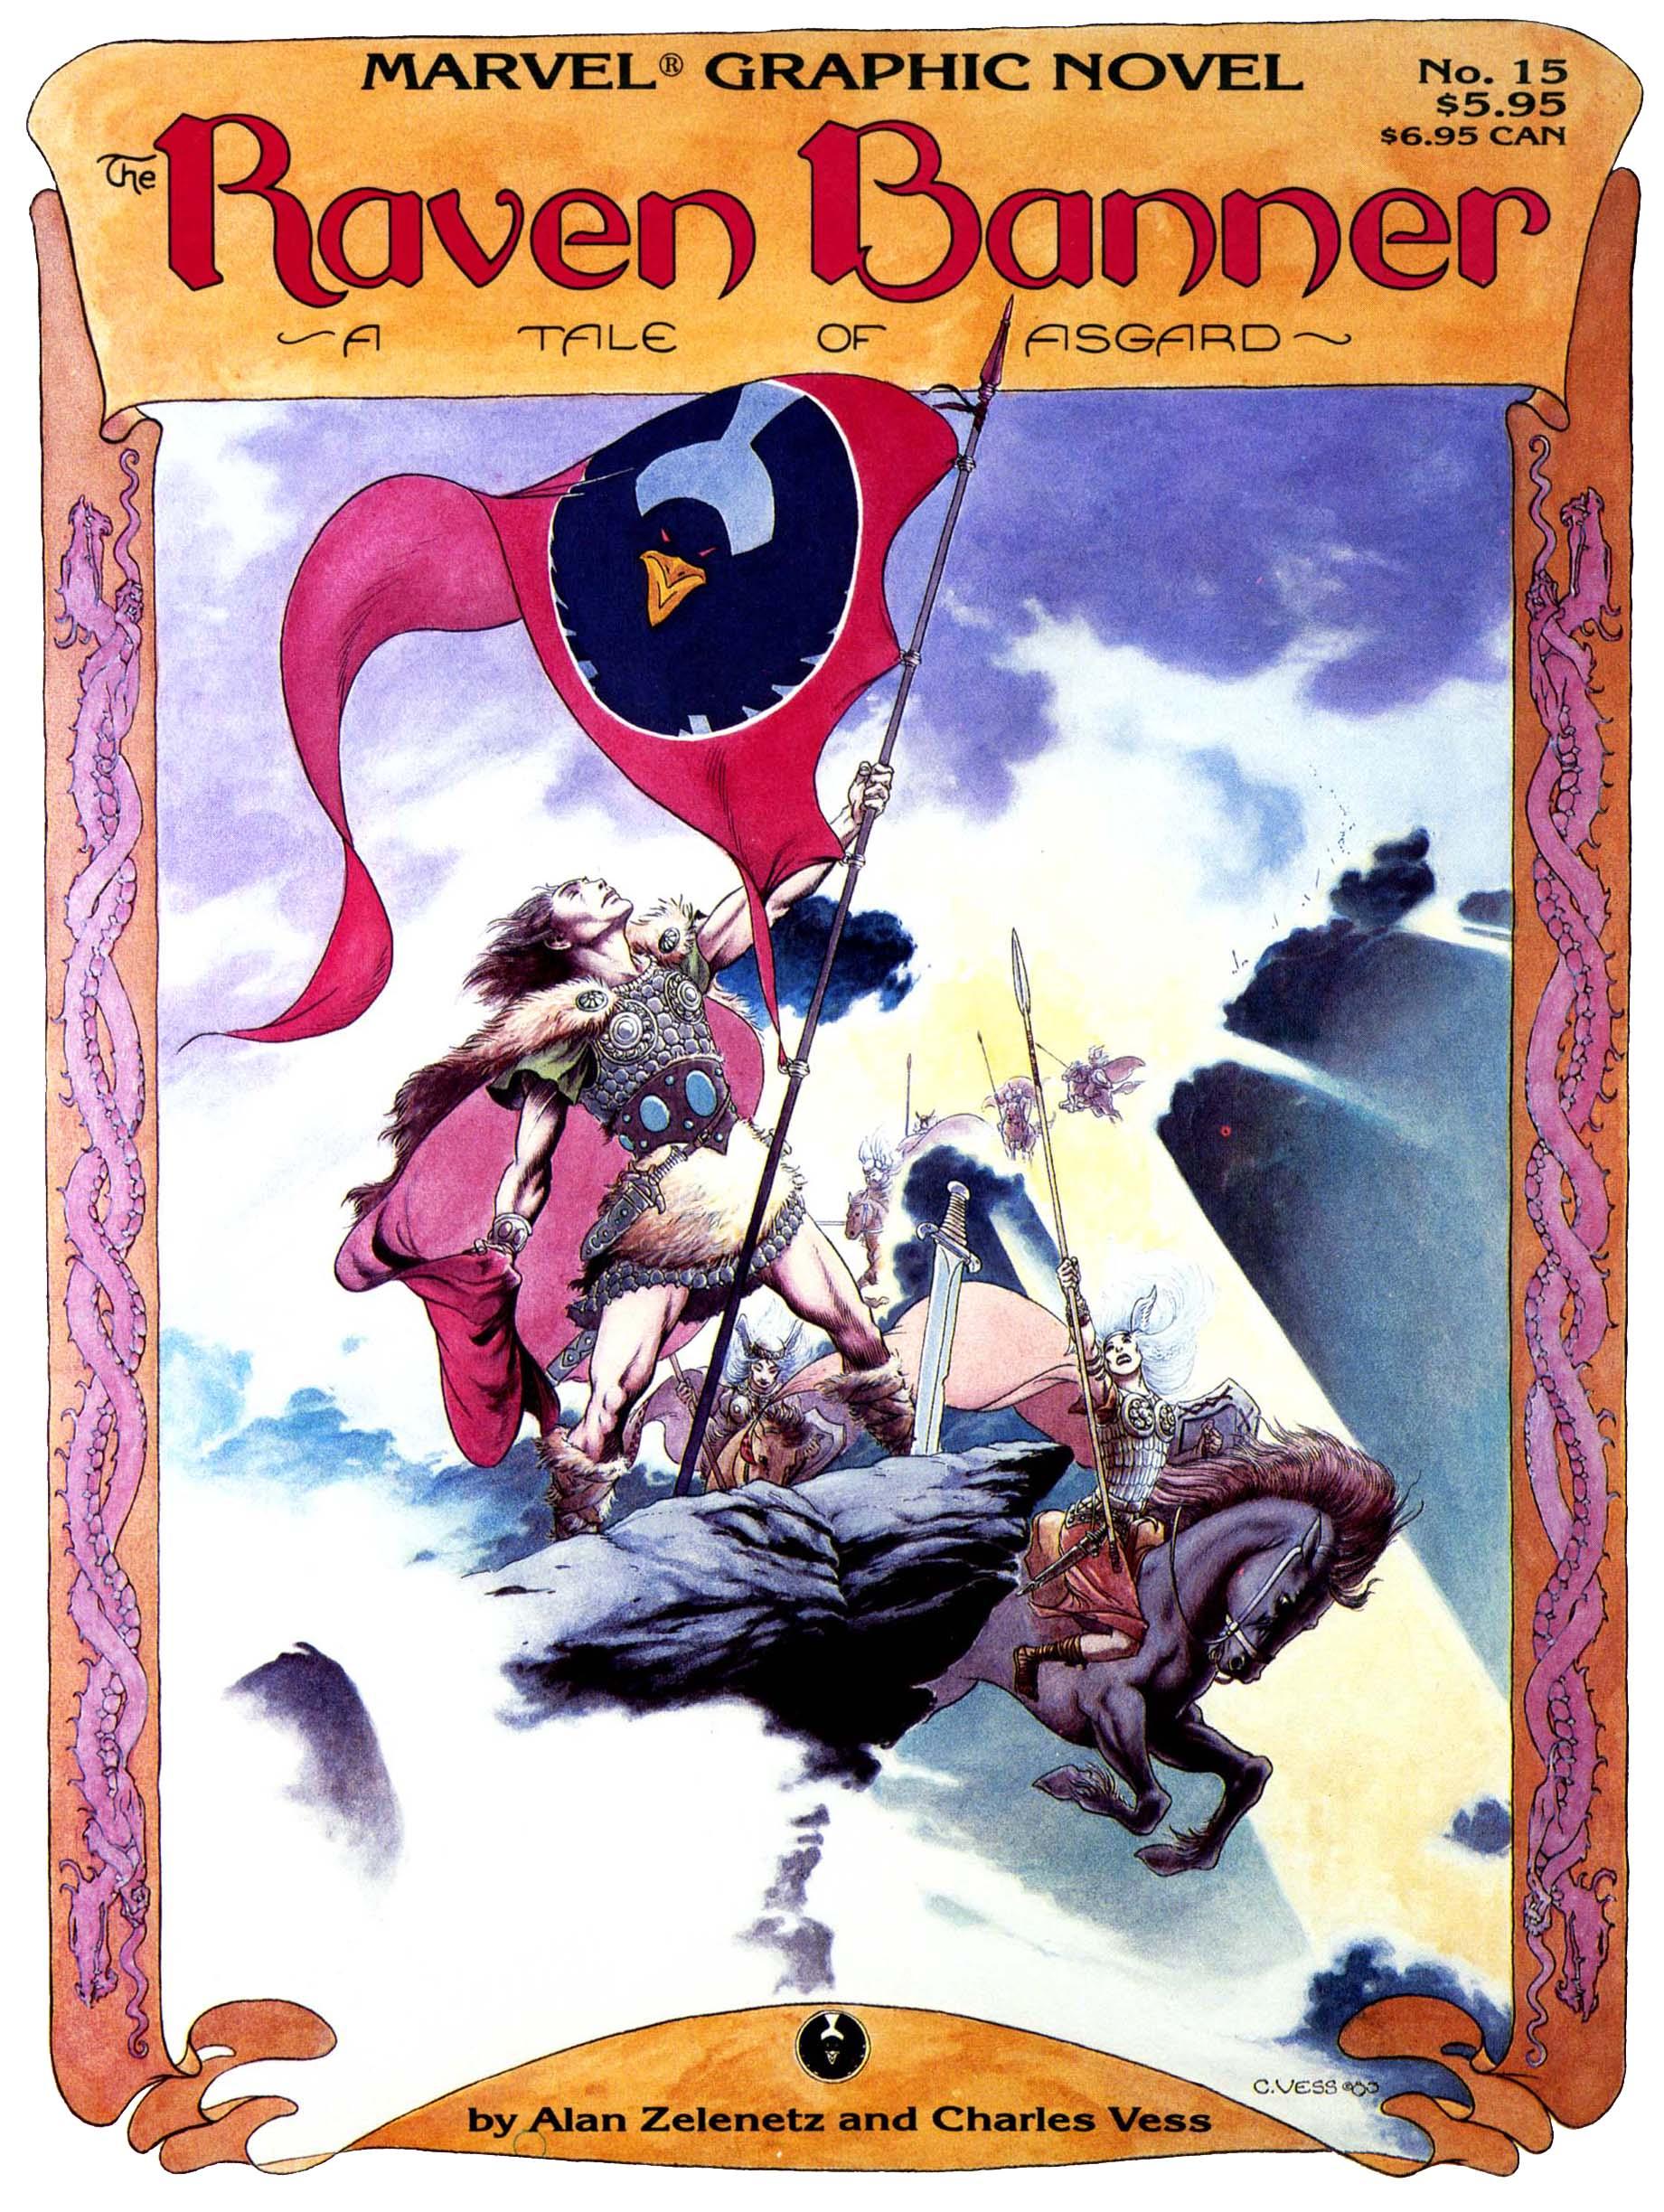 Marvel Graphic Novel 15_-_The_Raven_Banner Page 1